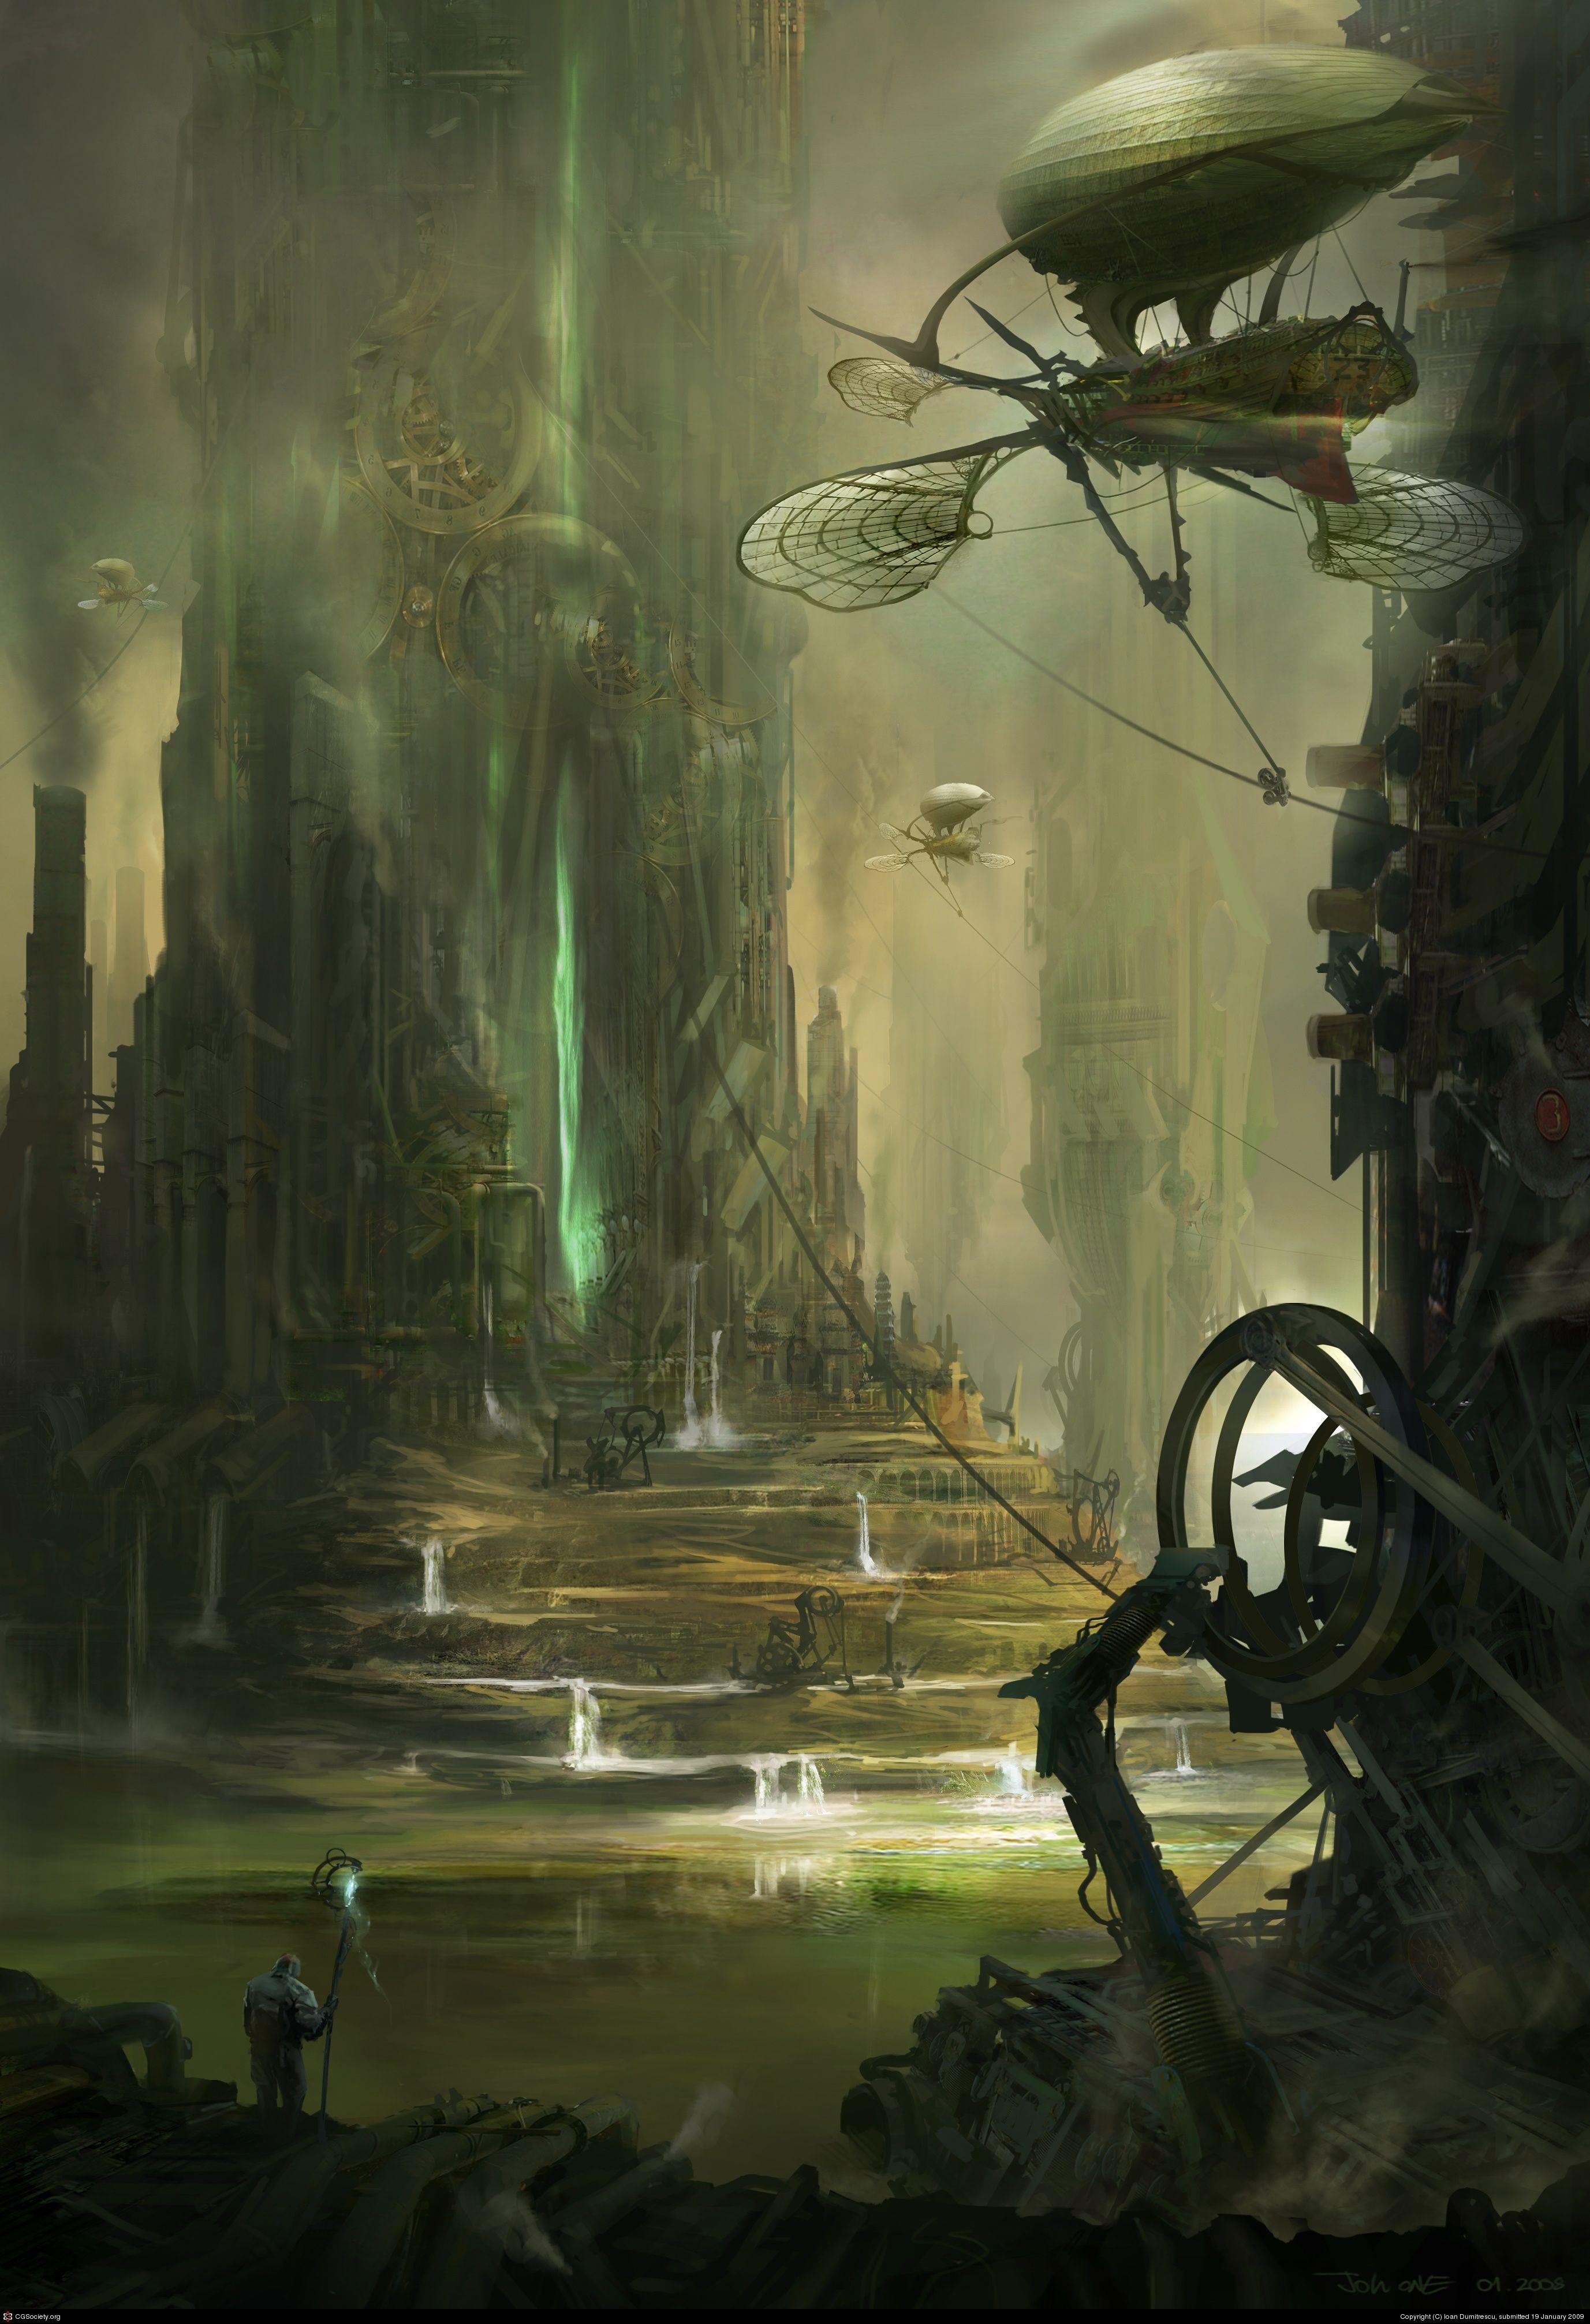 Steampunk Art Game Design - Environments